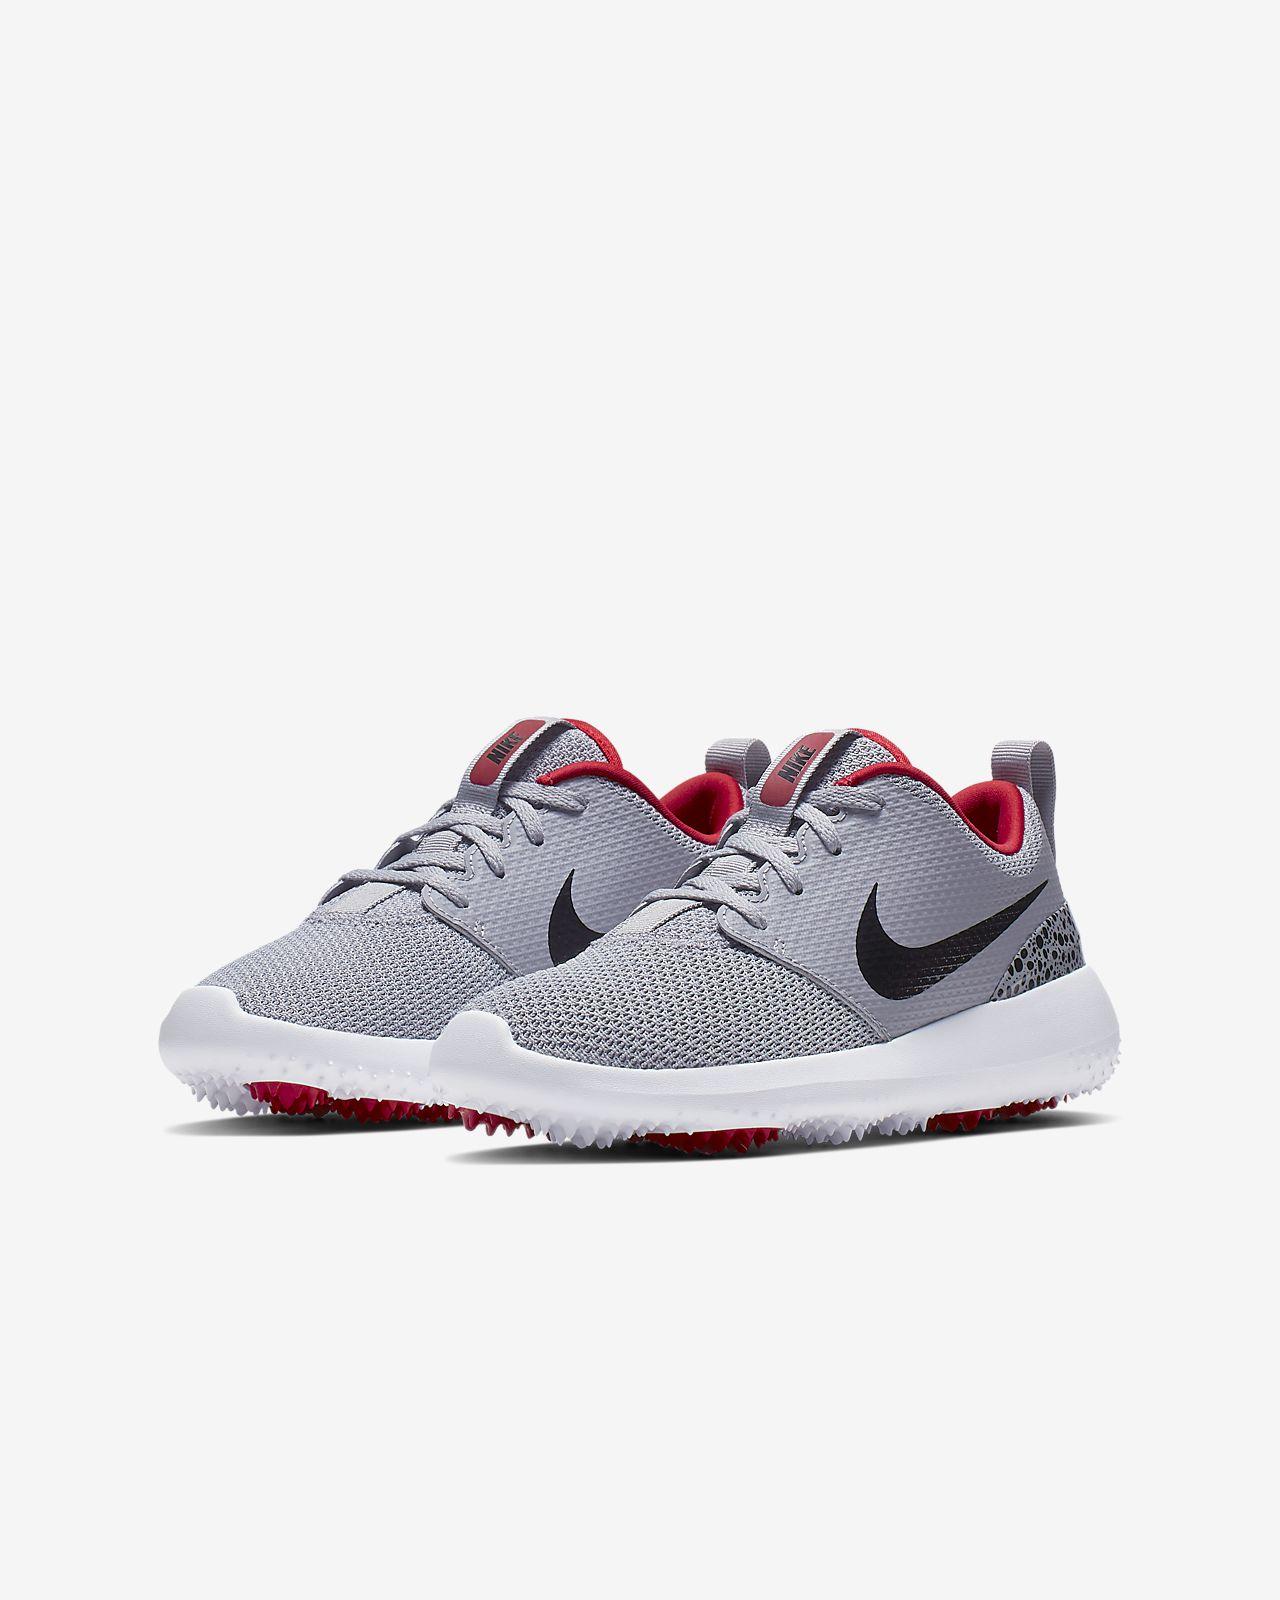 Nike Roshe One Neymar Junior Chaussures Enfant Chausport